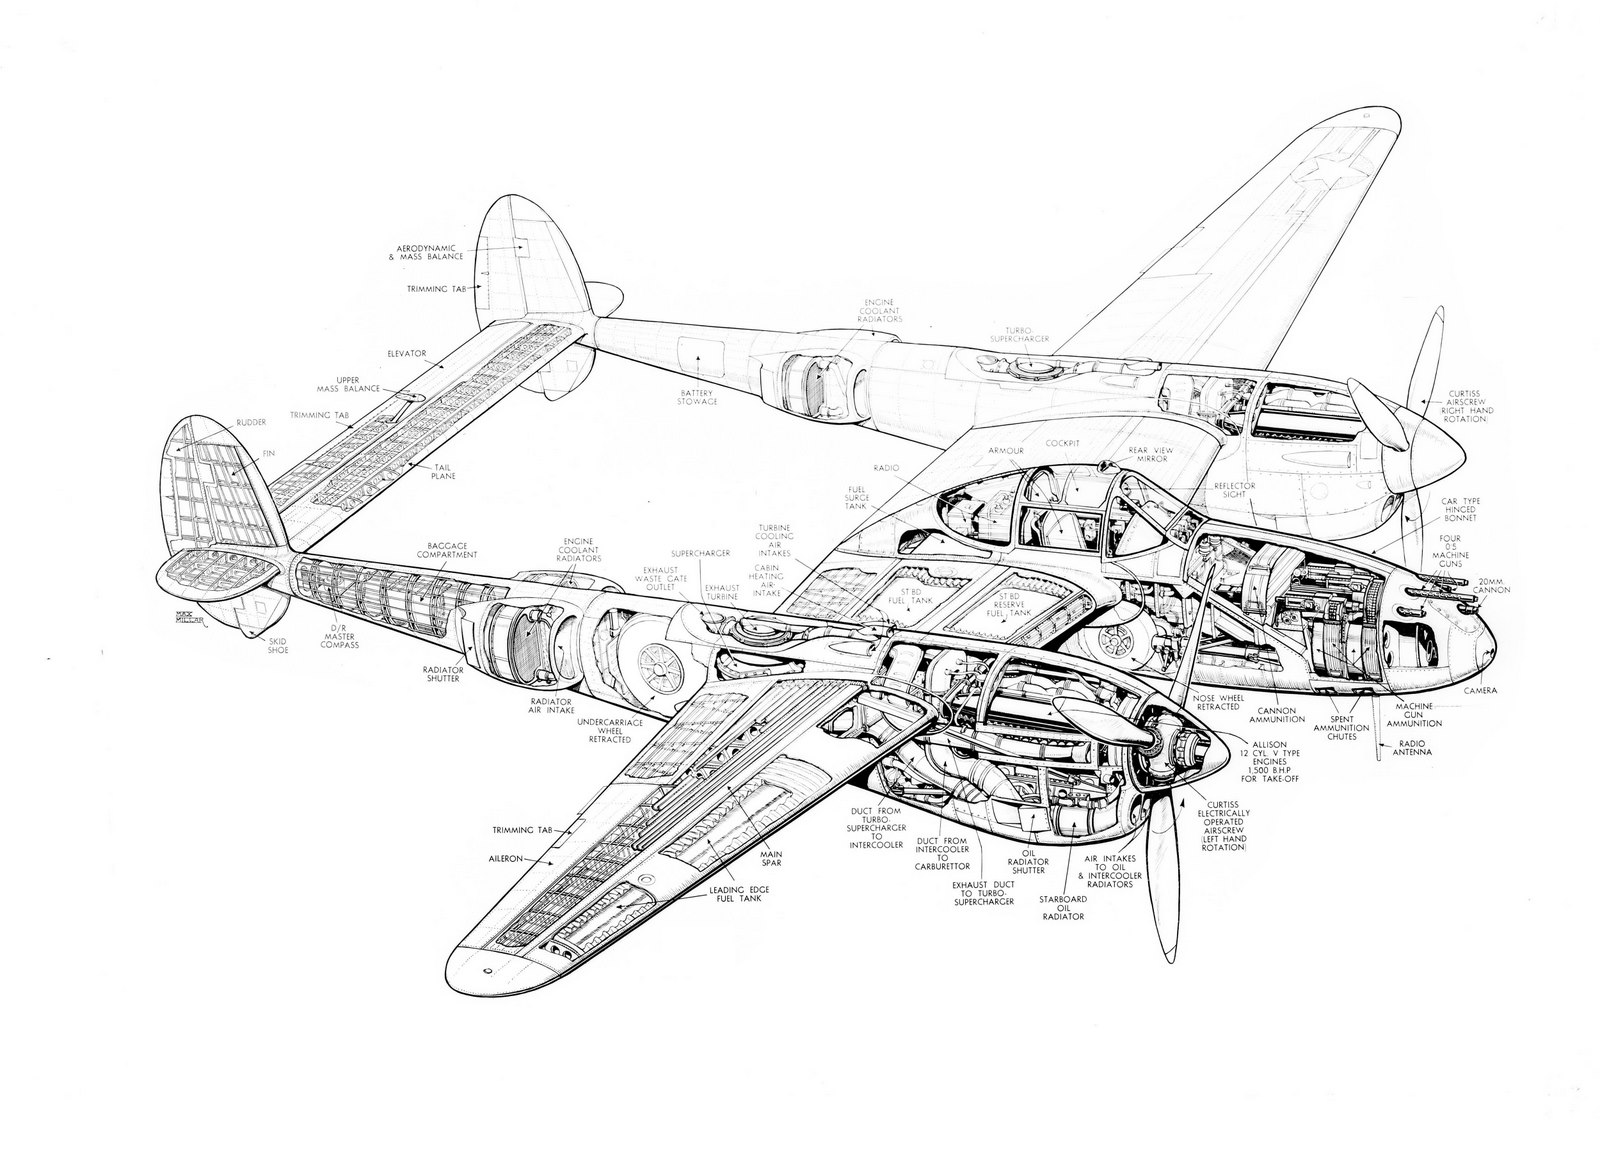 Lockheed P 38 Lightning Schematics, Lockheed, Free Engine